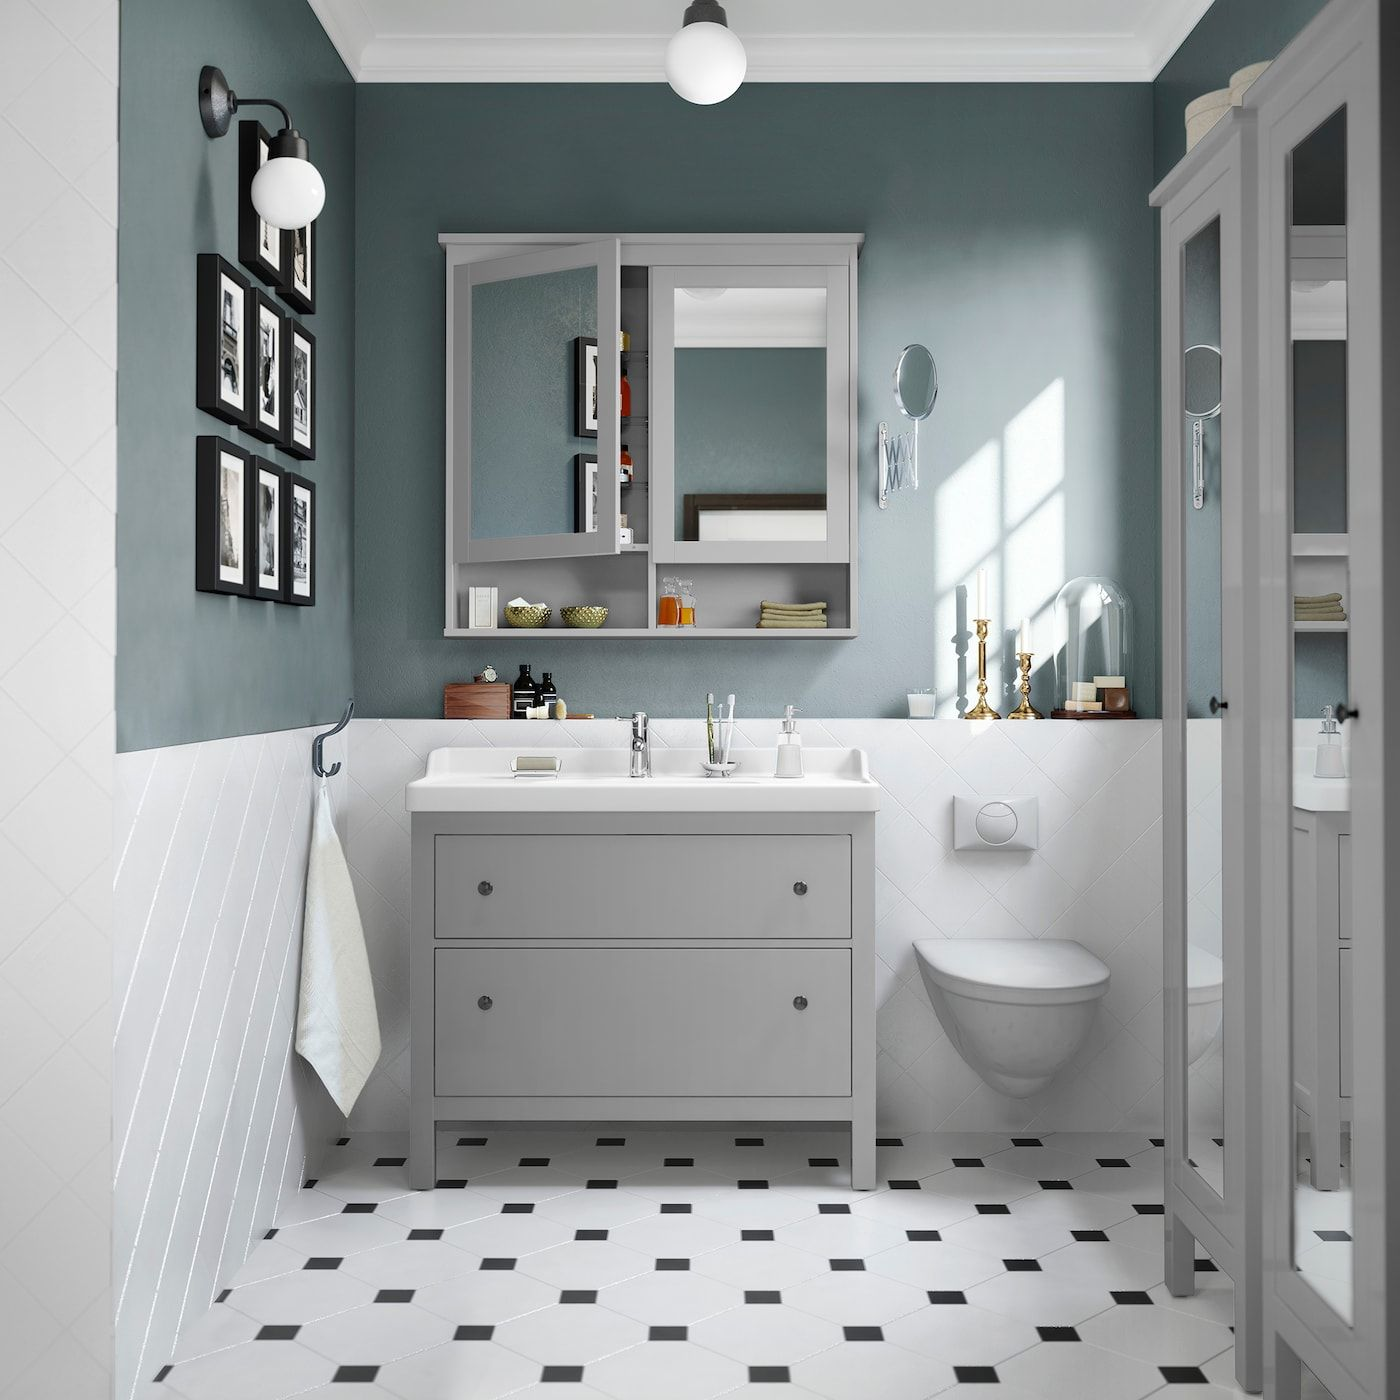 Elegantes Badezimmer In Hellen Farben Badezimmer Badezimmereinrichtung Badezimmer Einrichtung